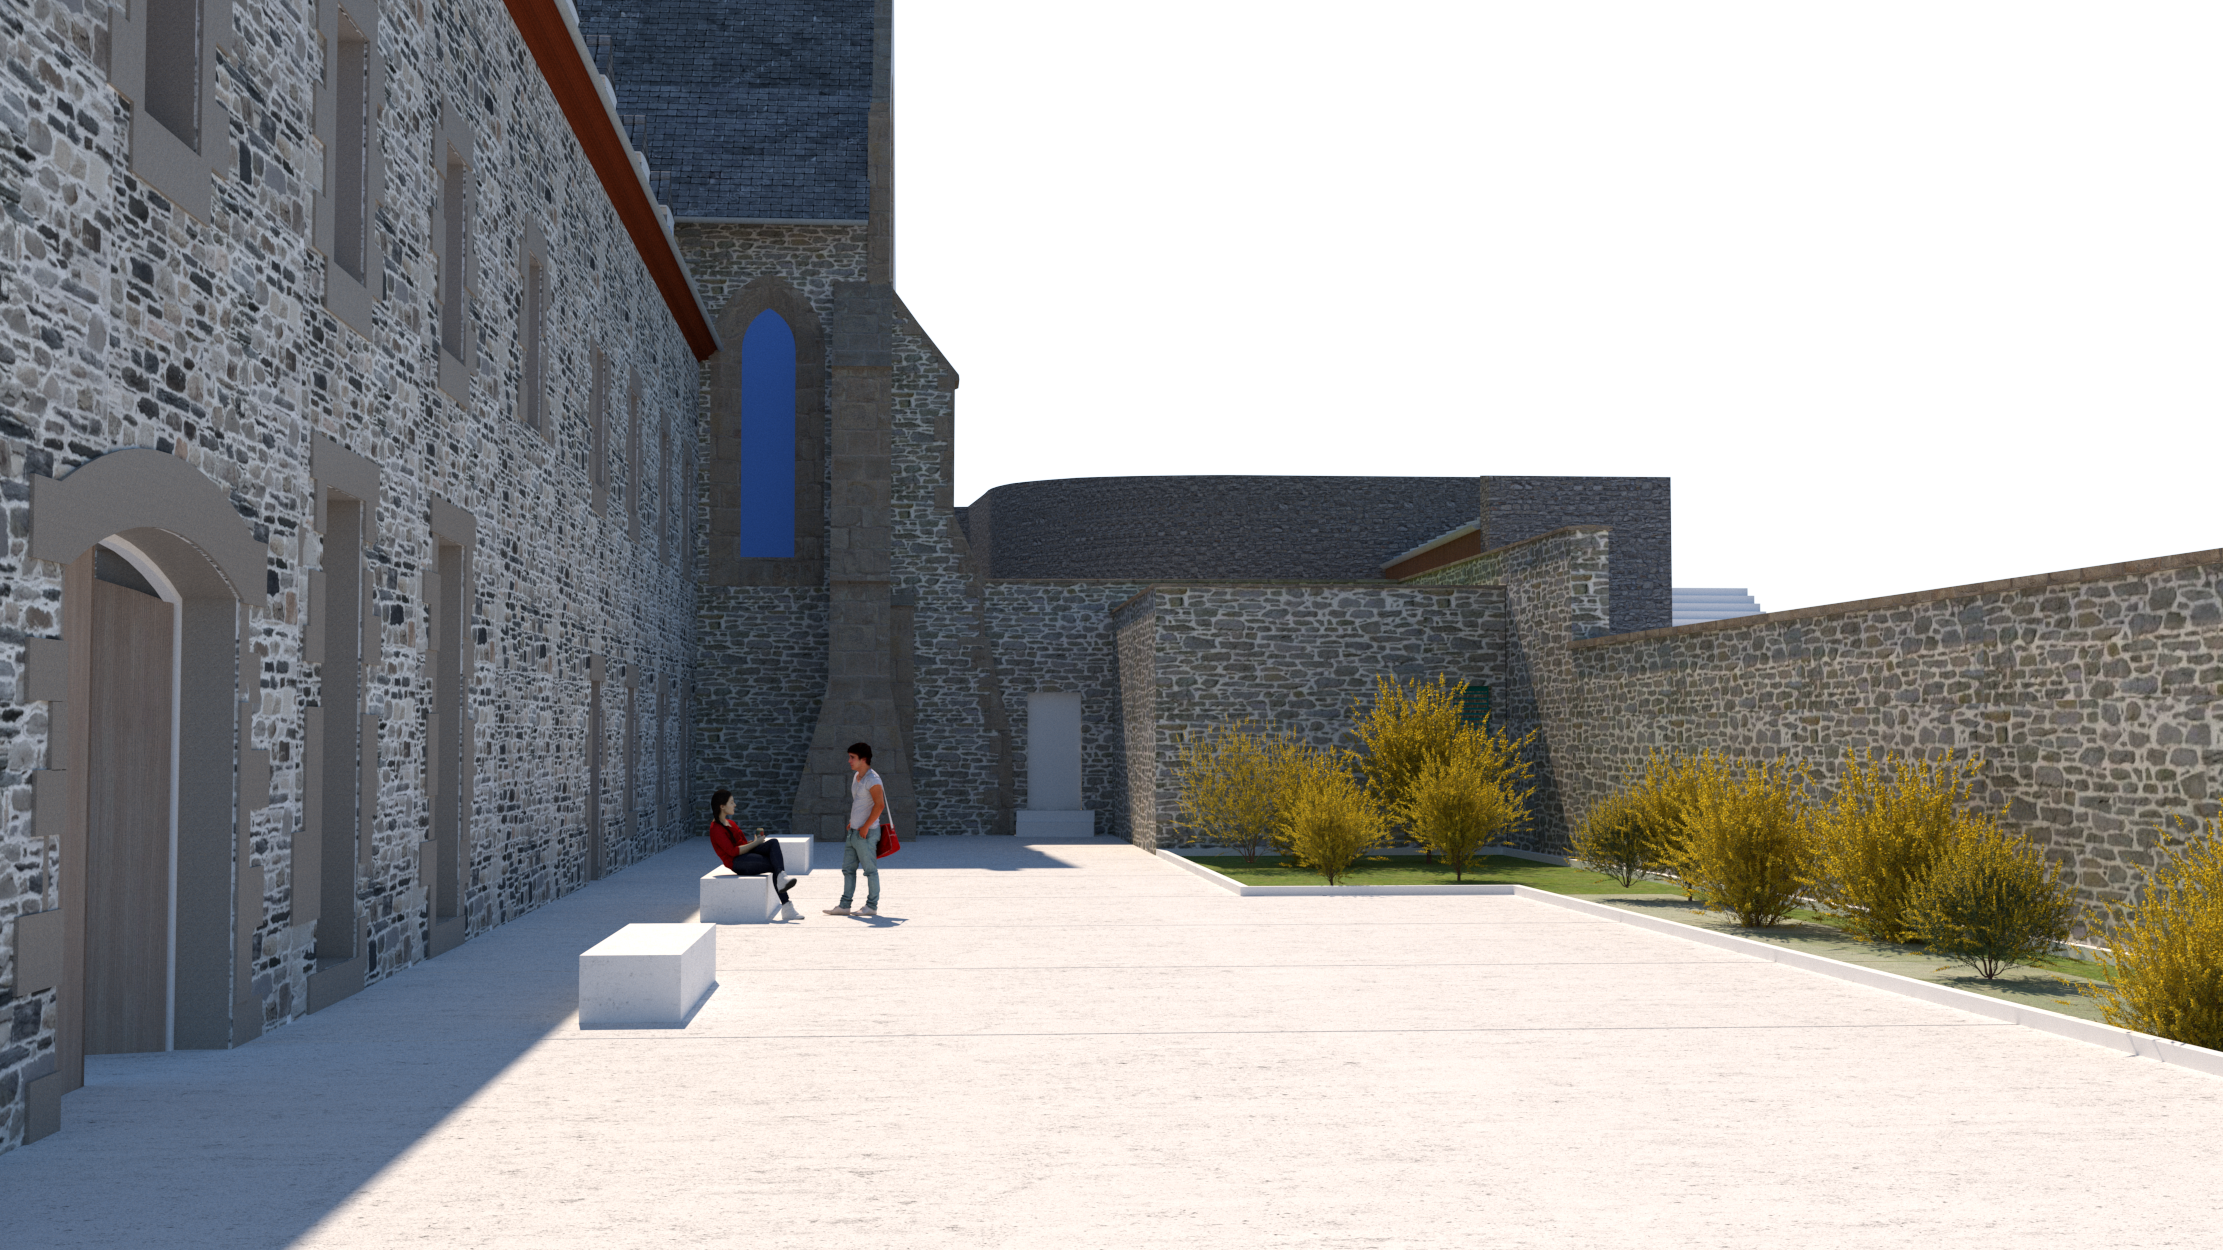 jacobins_museum_morlaix_public_outdoor_design_christophe_gautrand_landscape_2.jpg